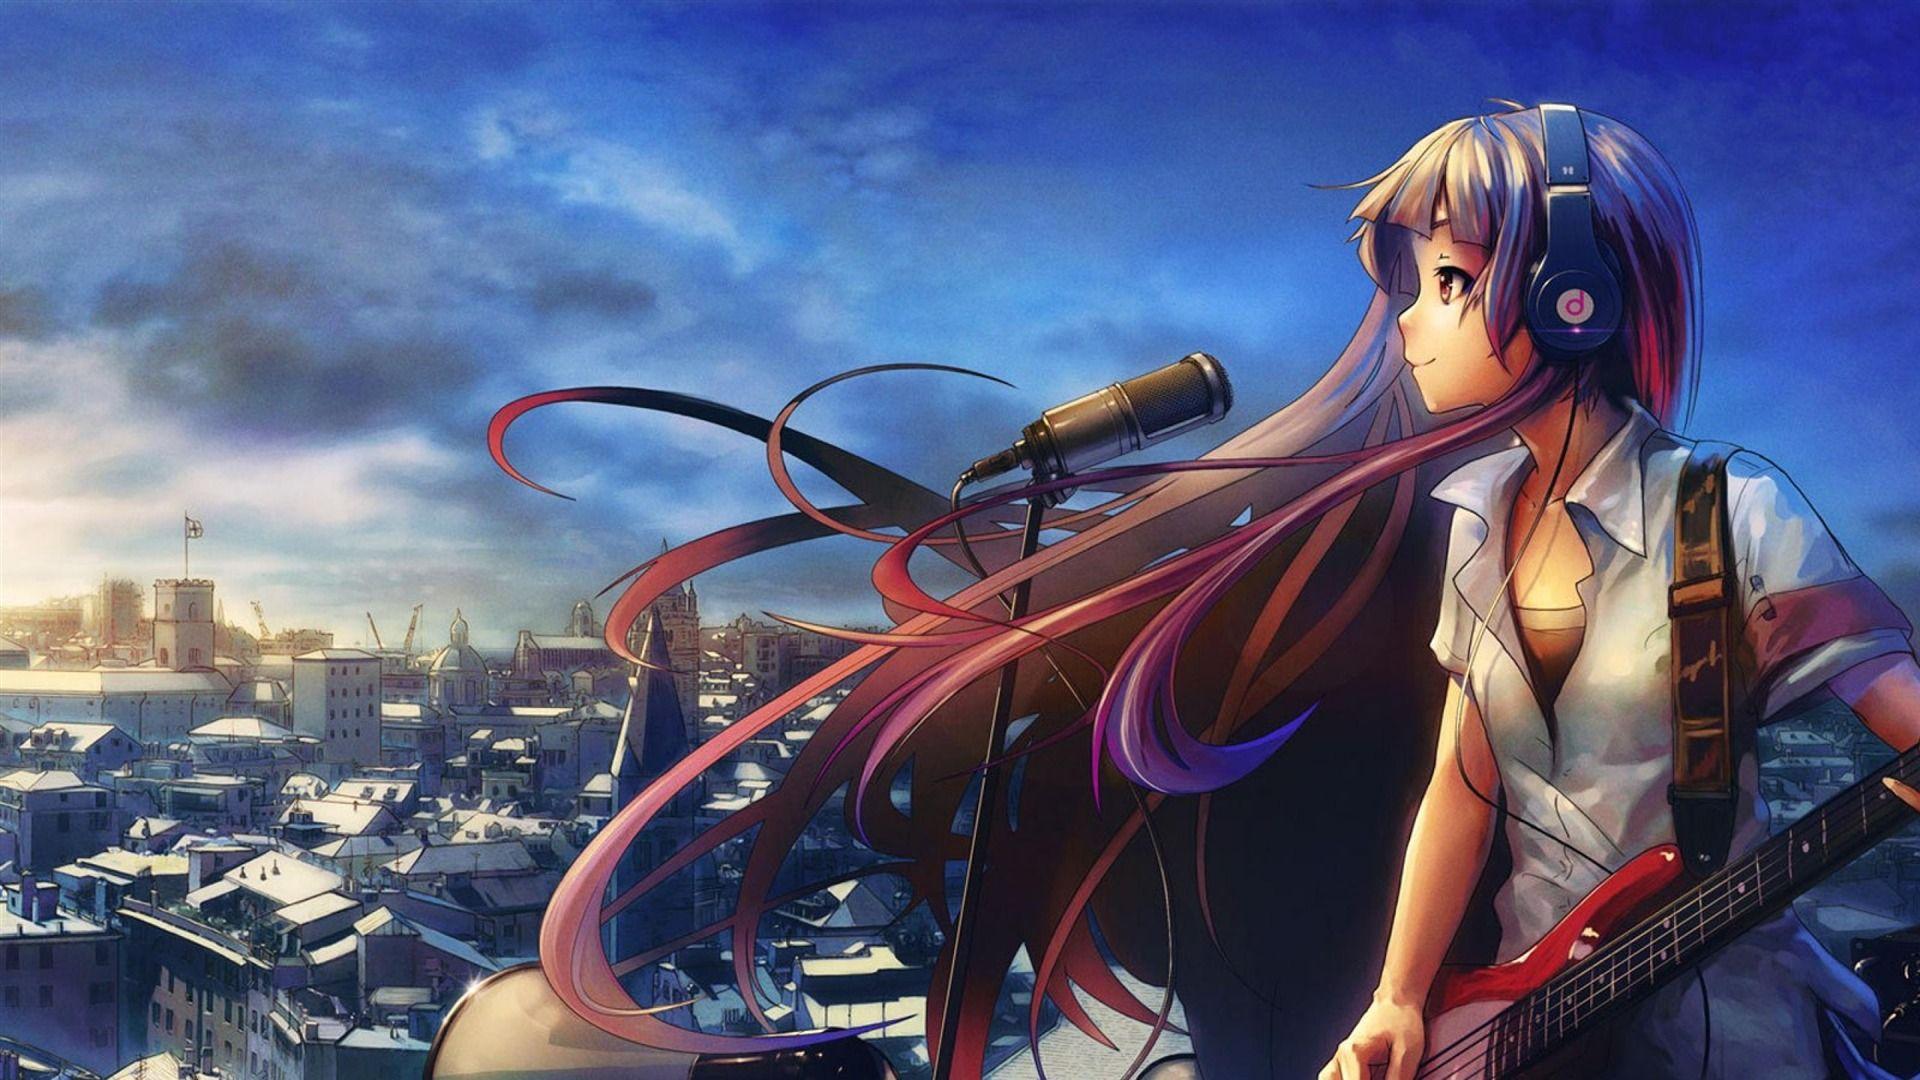 1528216 Jpg 1920 1080 Dessin Musique Dessin Anime